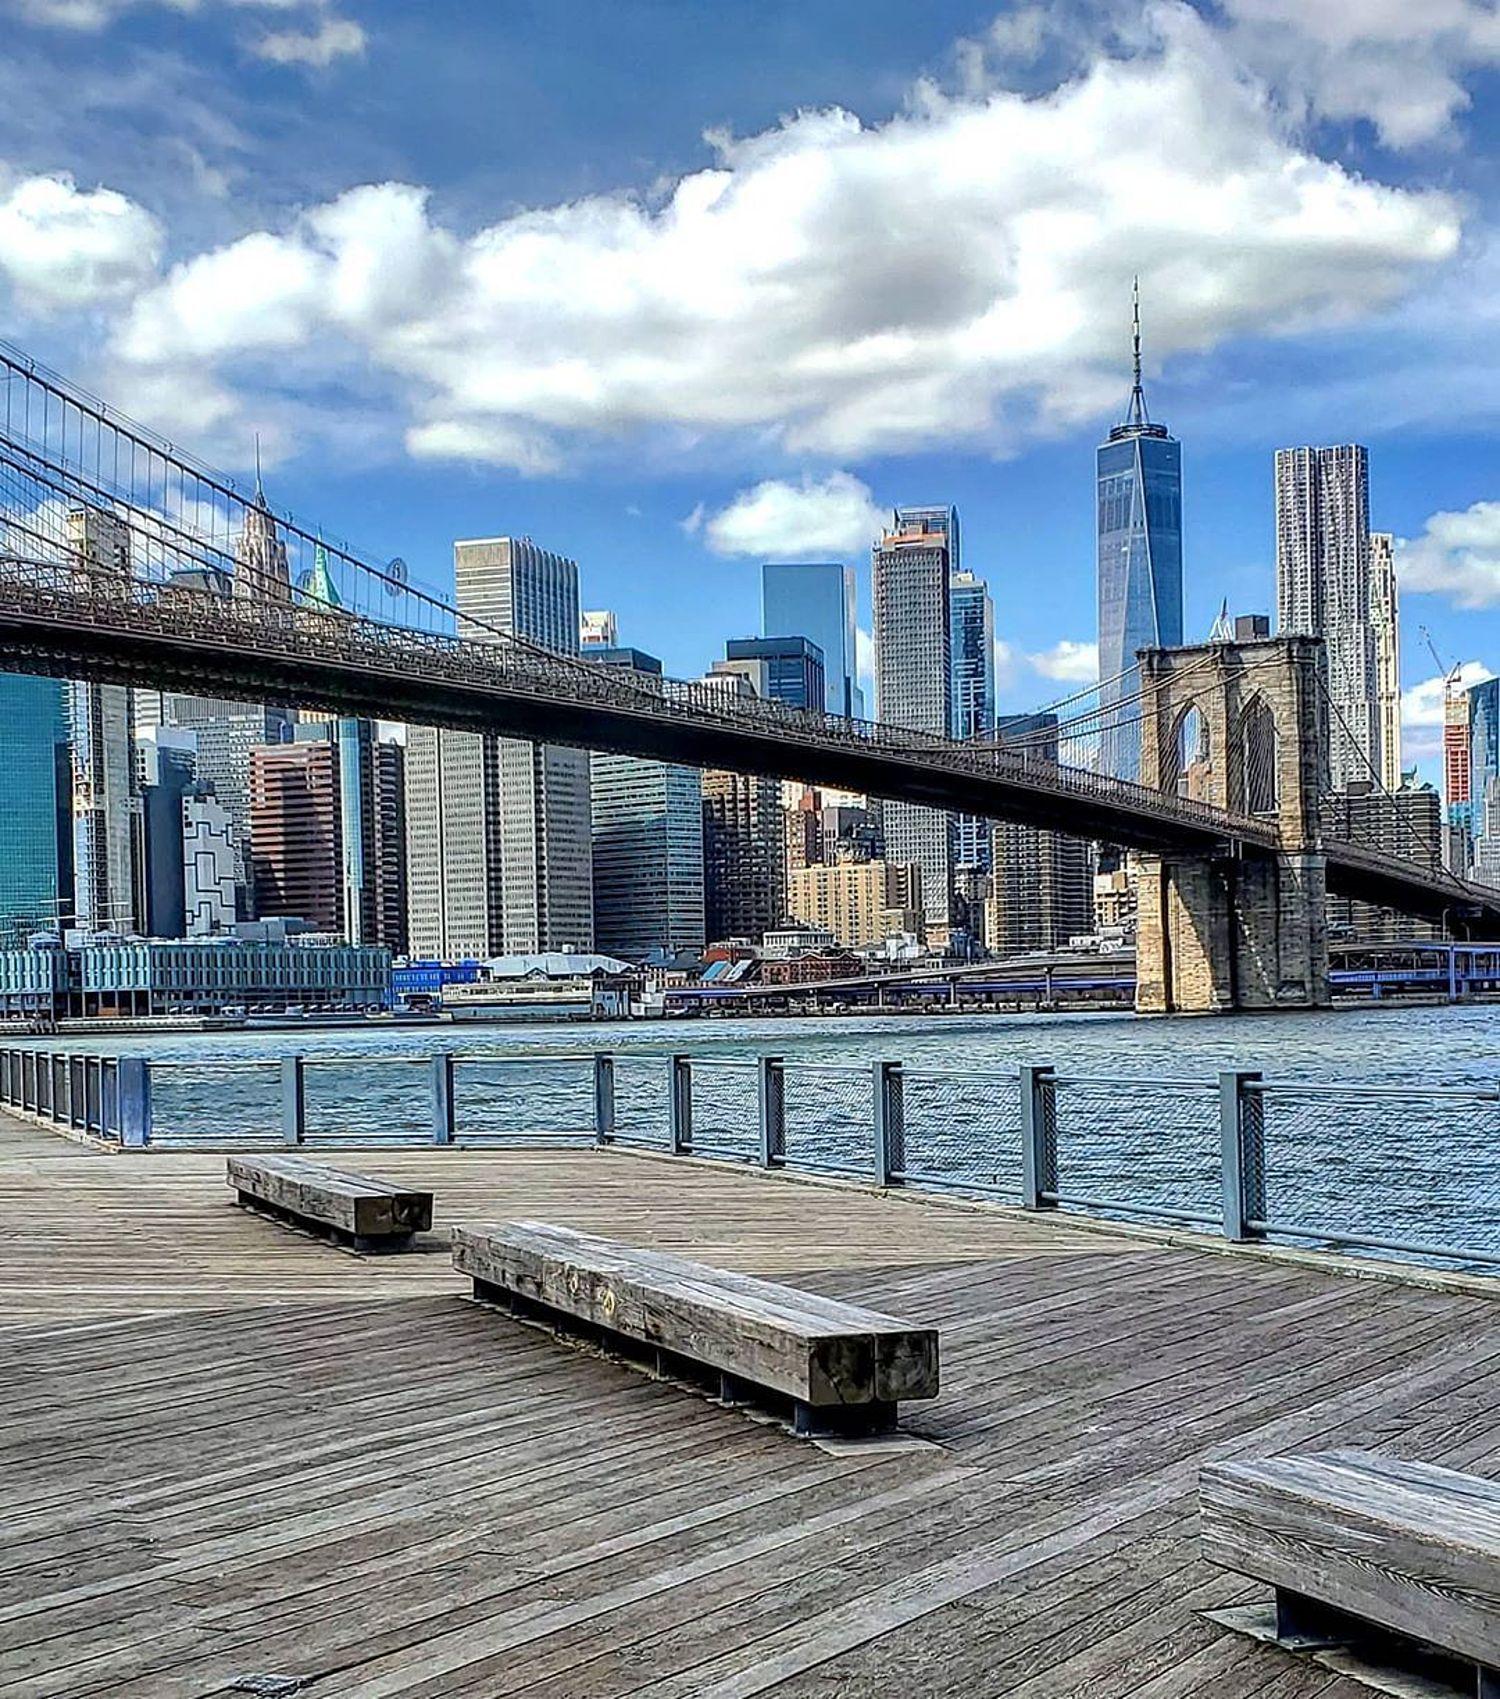 Brooklyn Bridge Park, DUMBO, Brooklyn